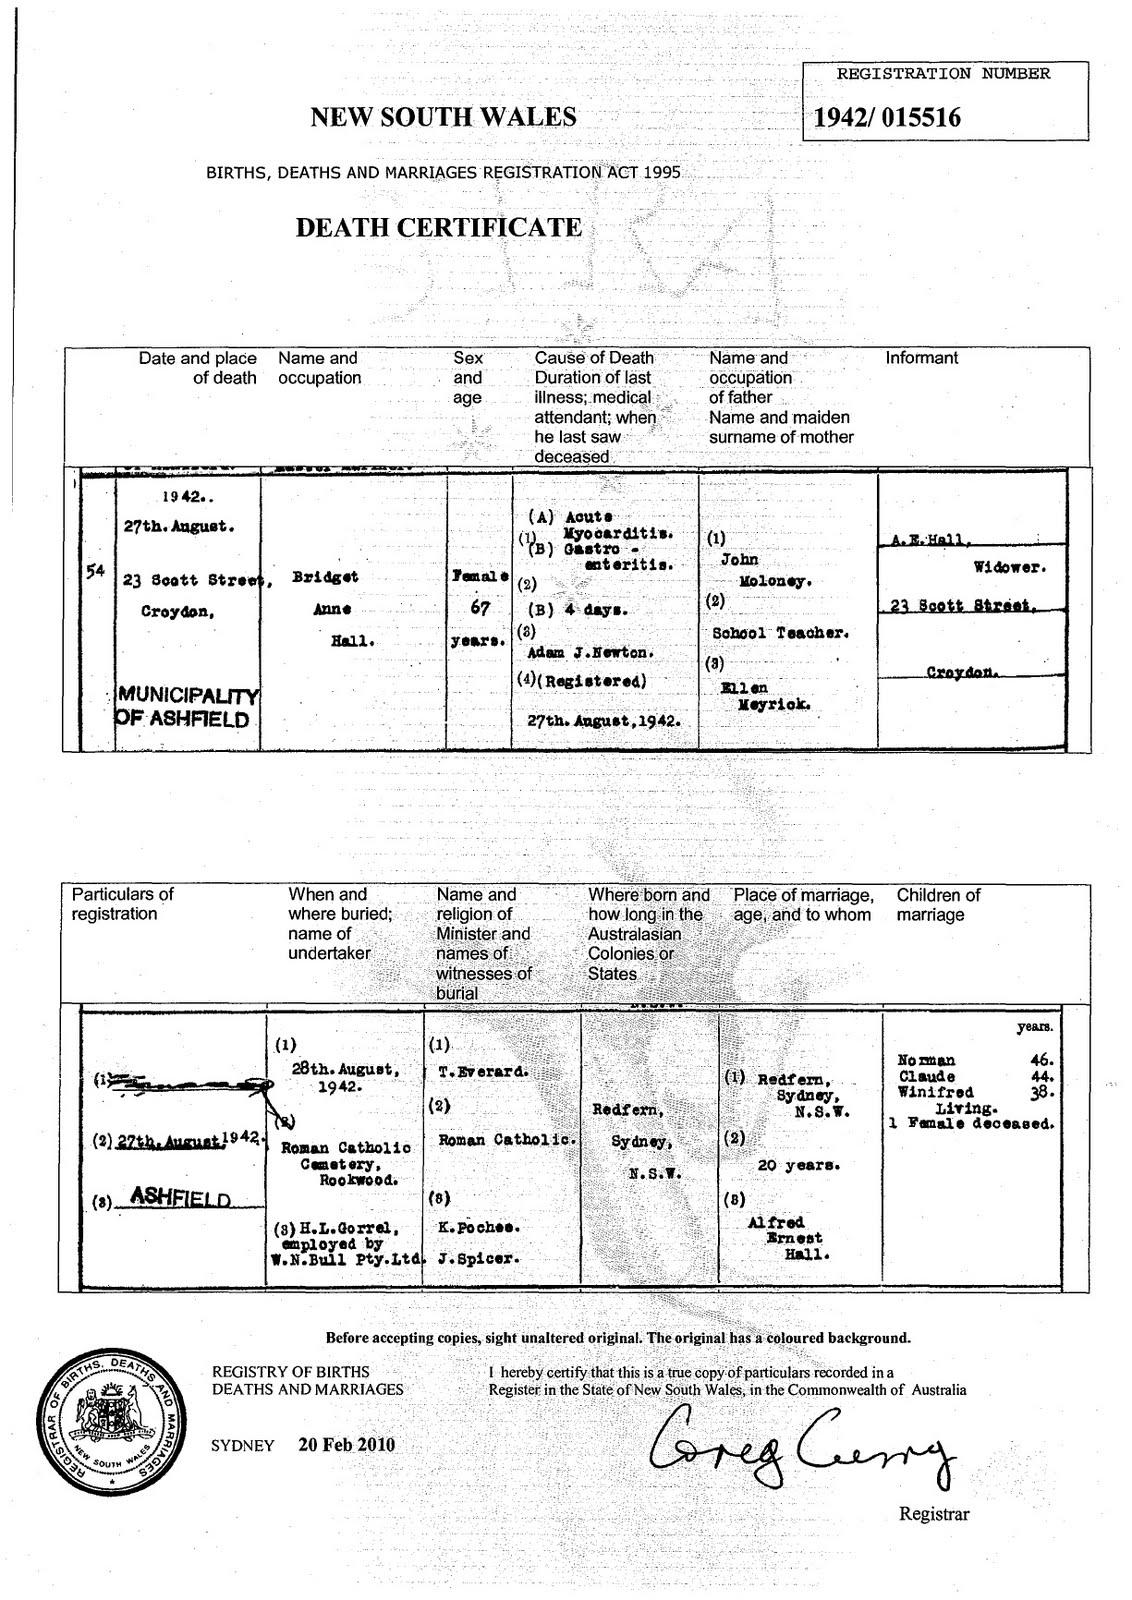 sydney birth records - photo#18